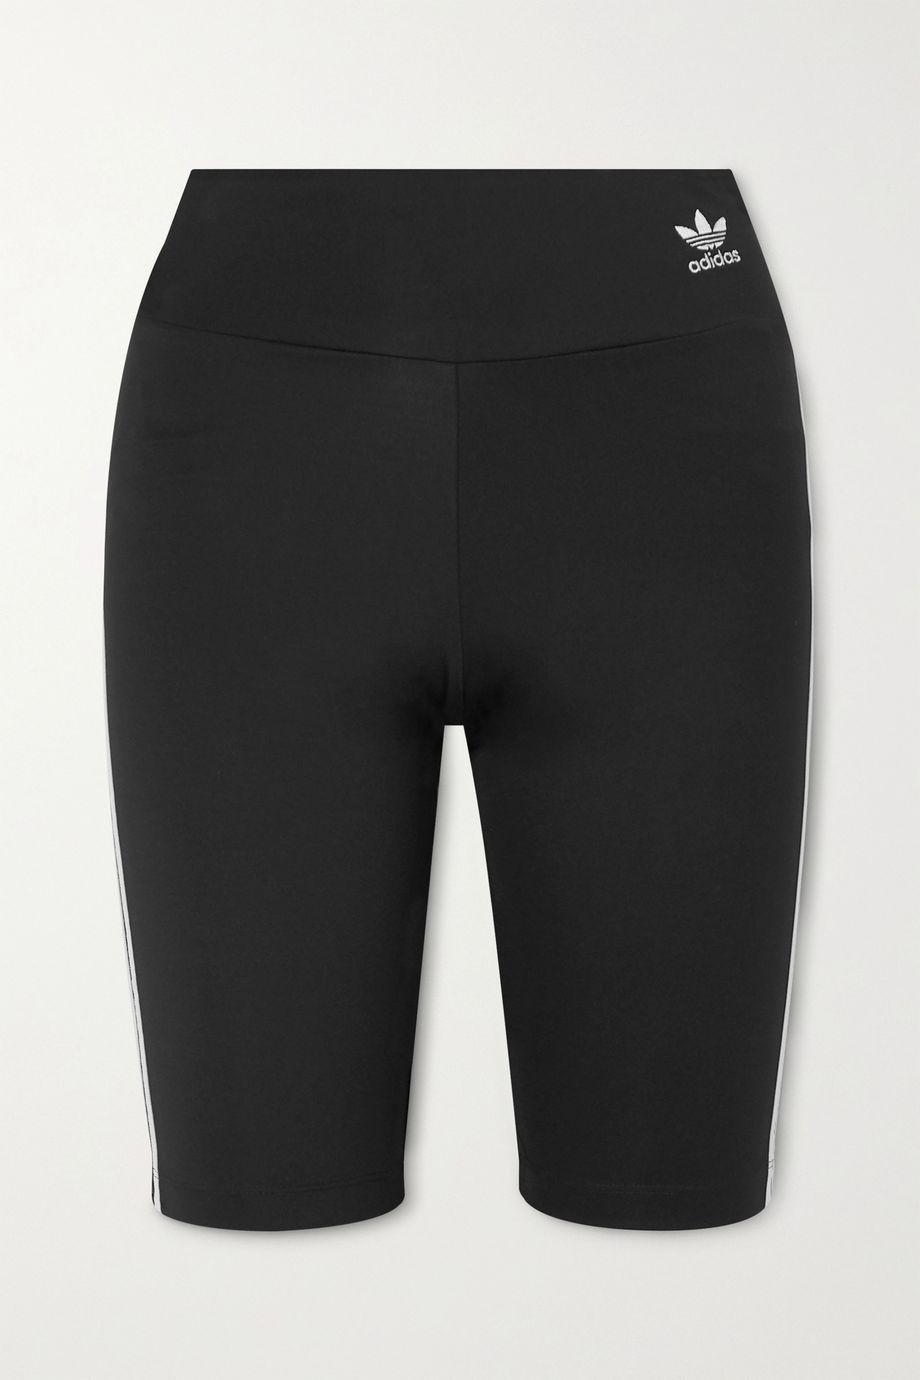 adidas jersey shorts